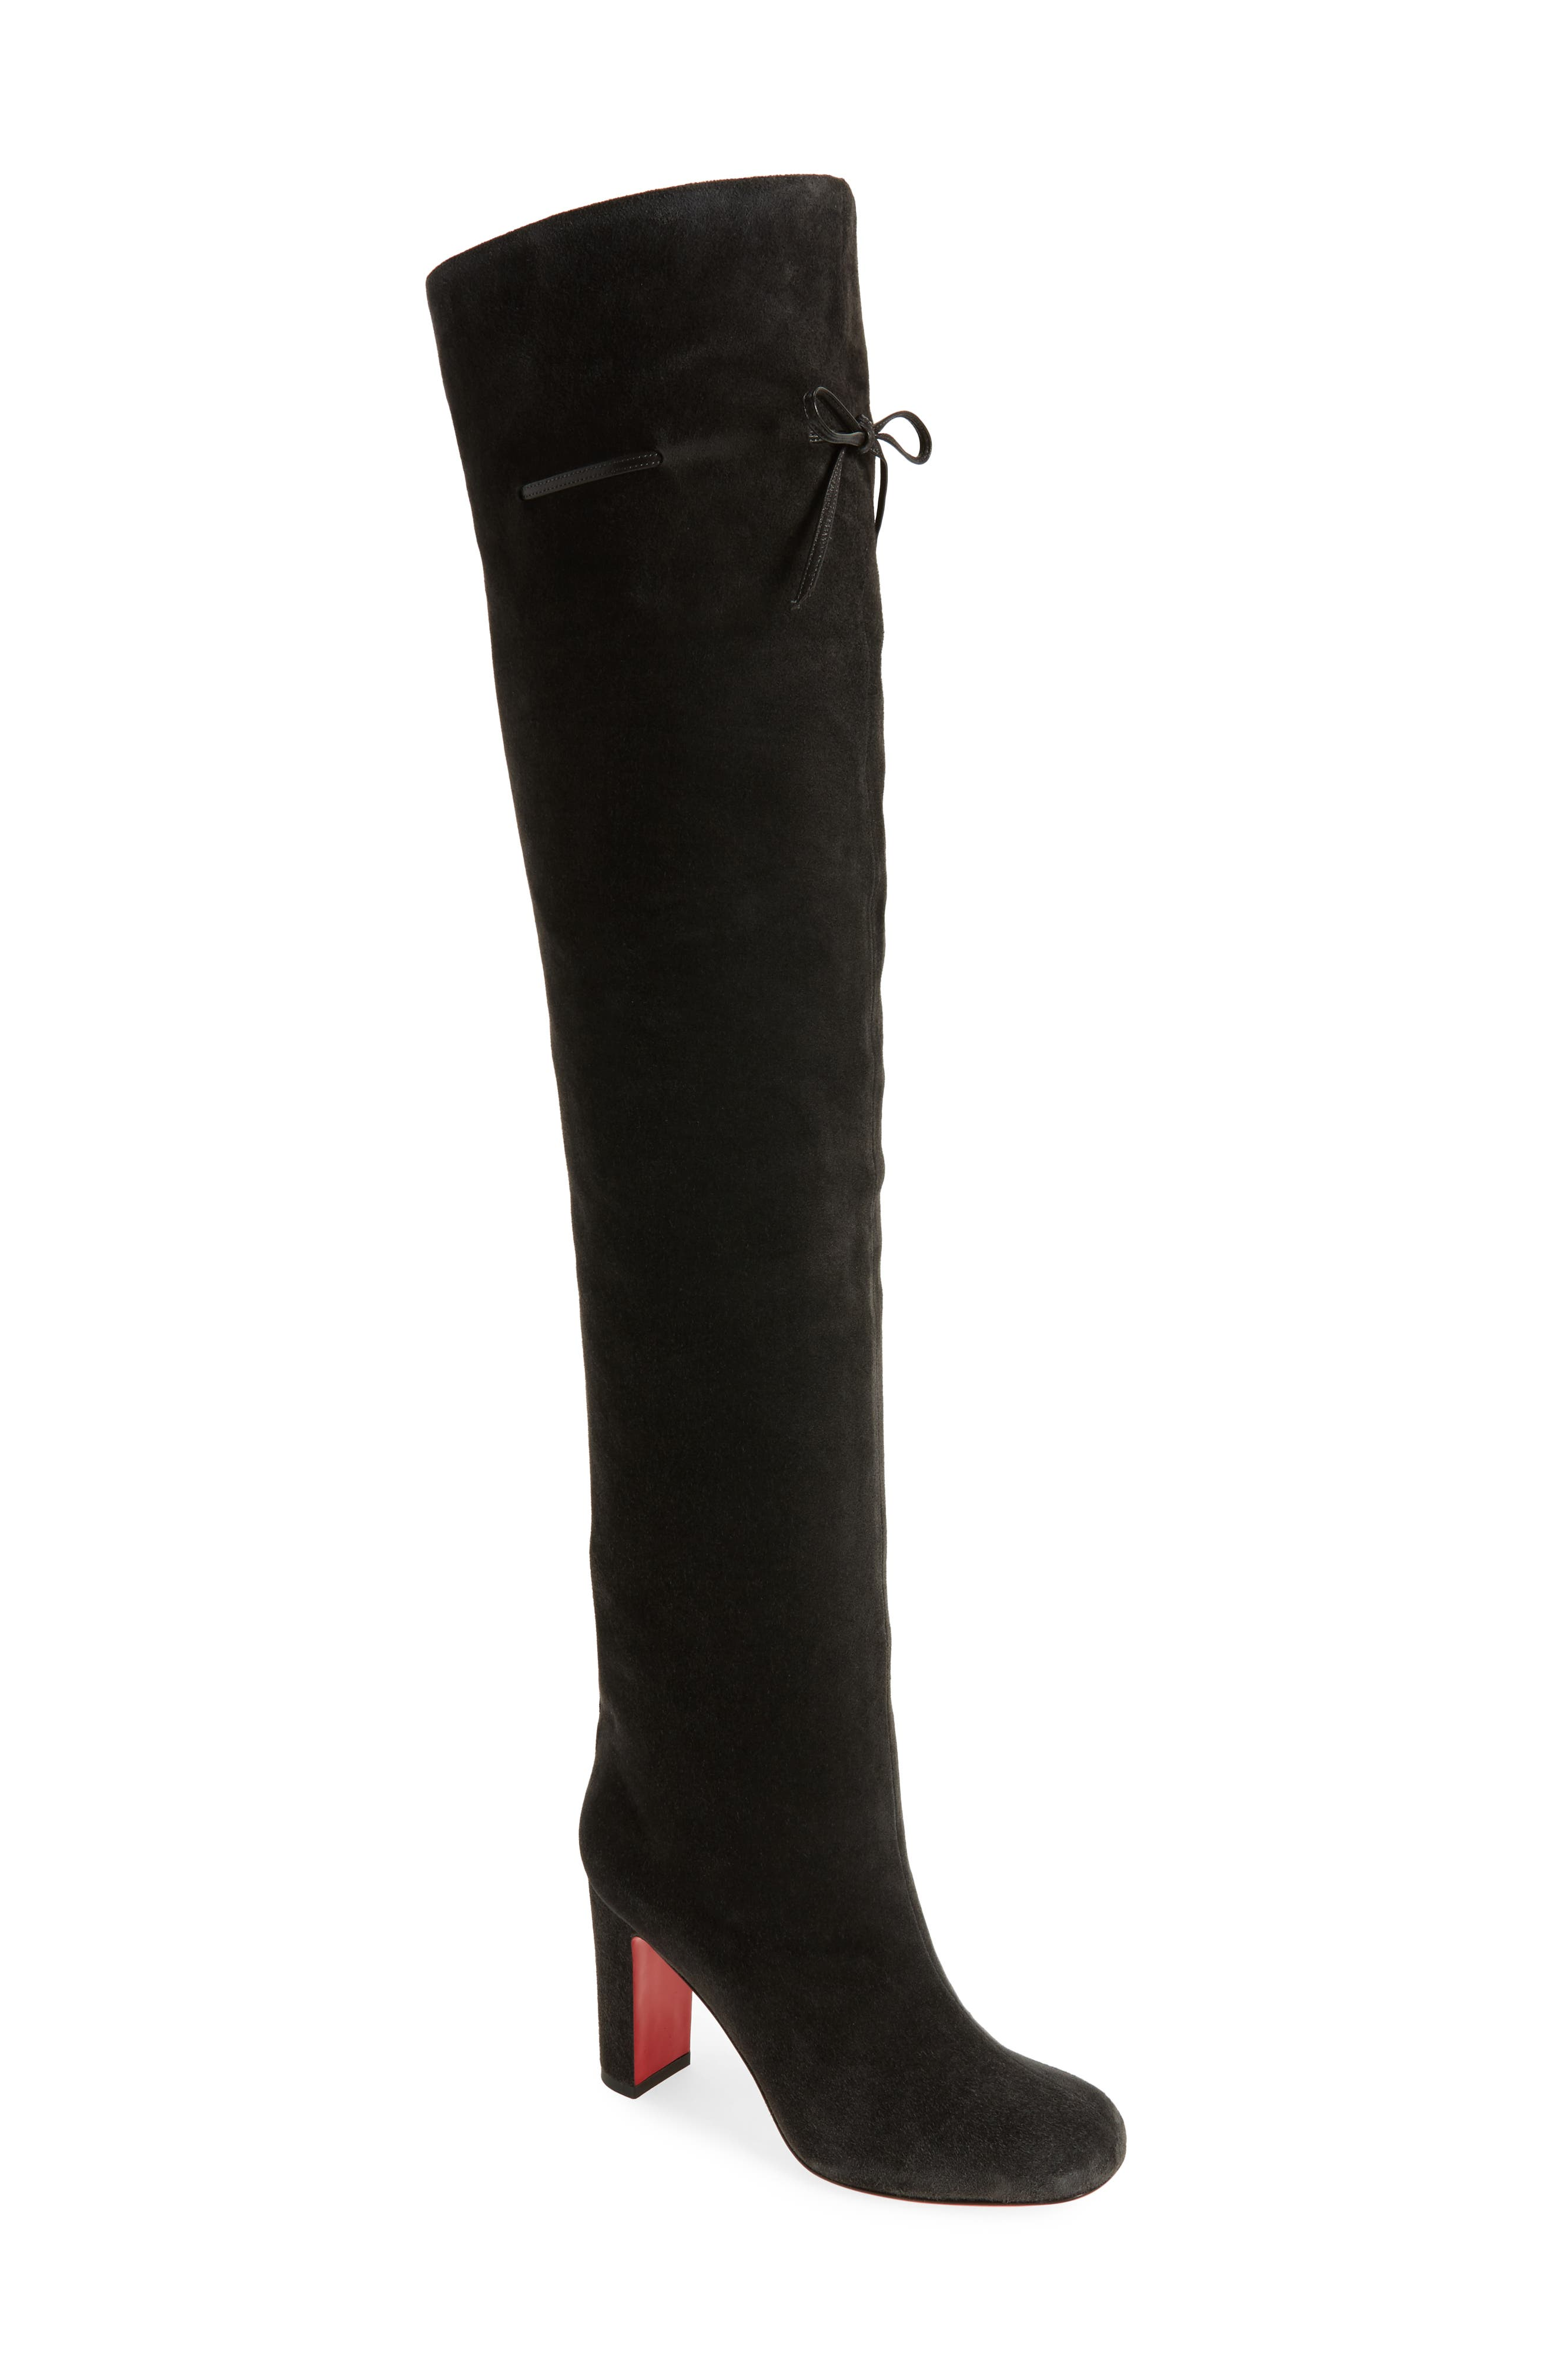 Alternate Image 1 Selected - Christian Louboutin Alta Gant Over the Knee Boot (Women)